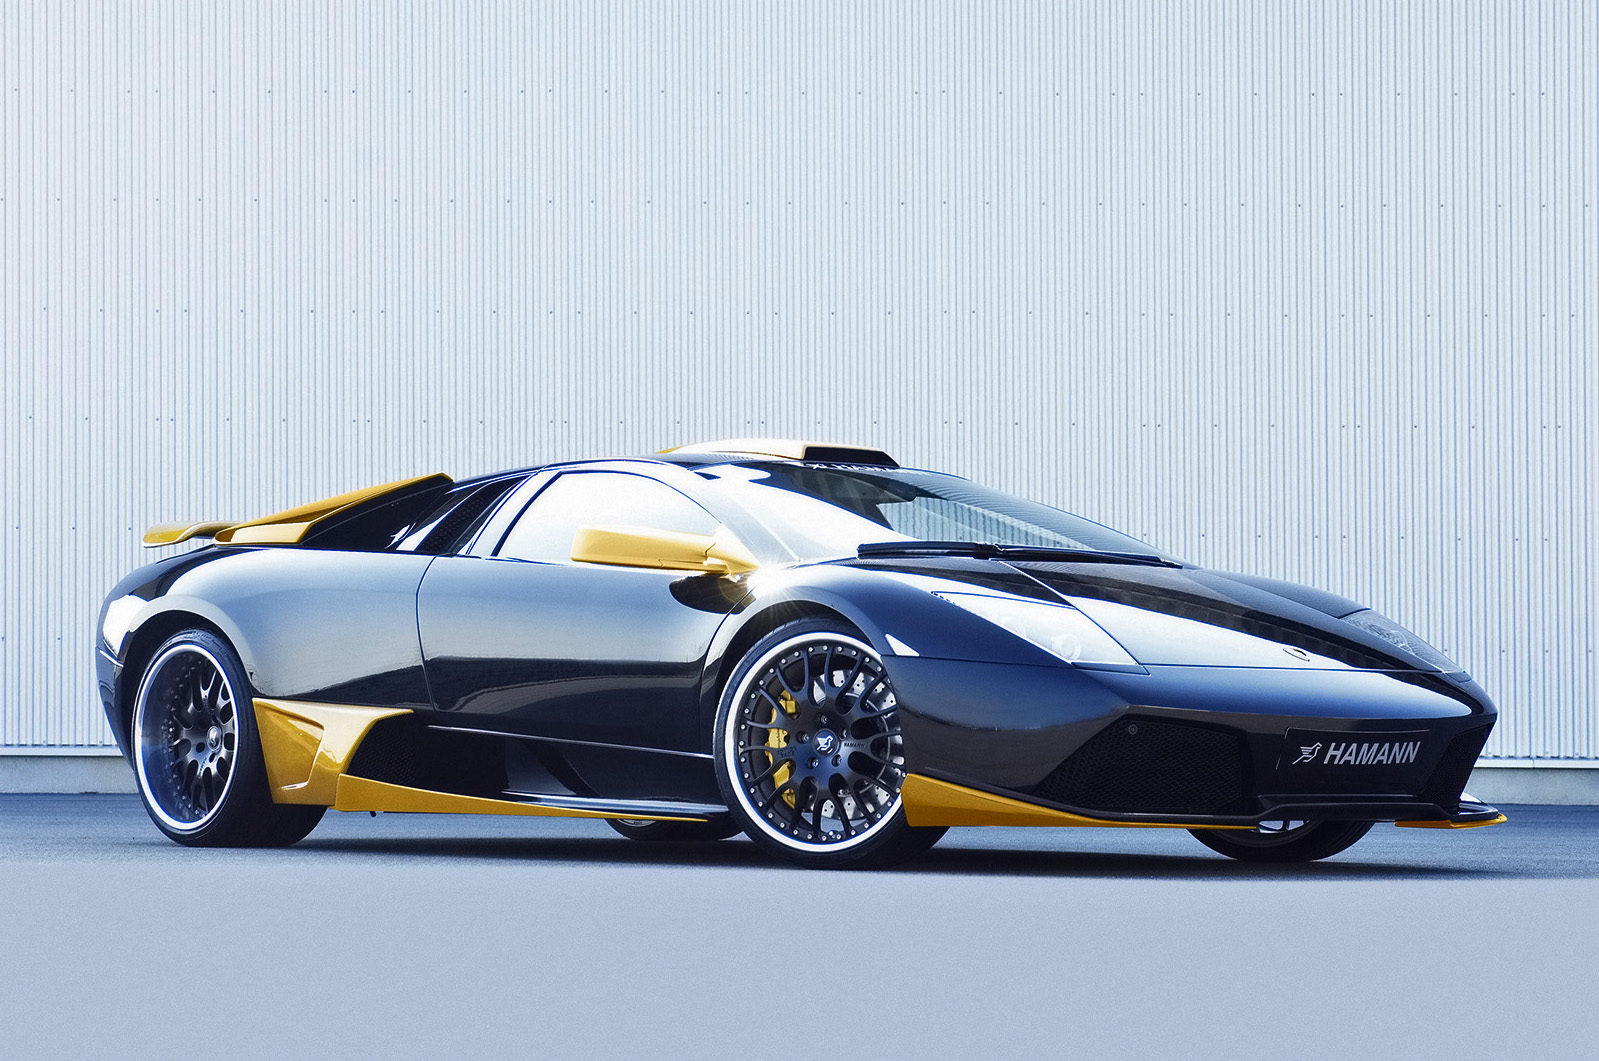 2007 Lamborghini Hamann Murcielago Lp640 Wallpapers Hd